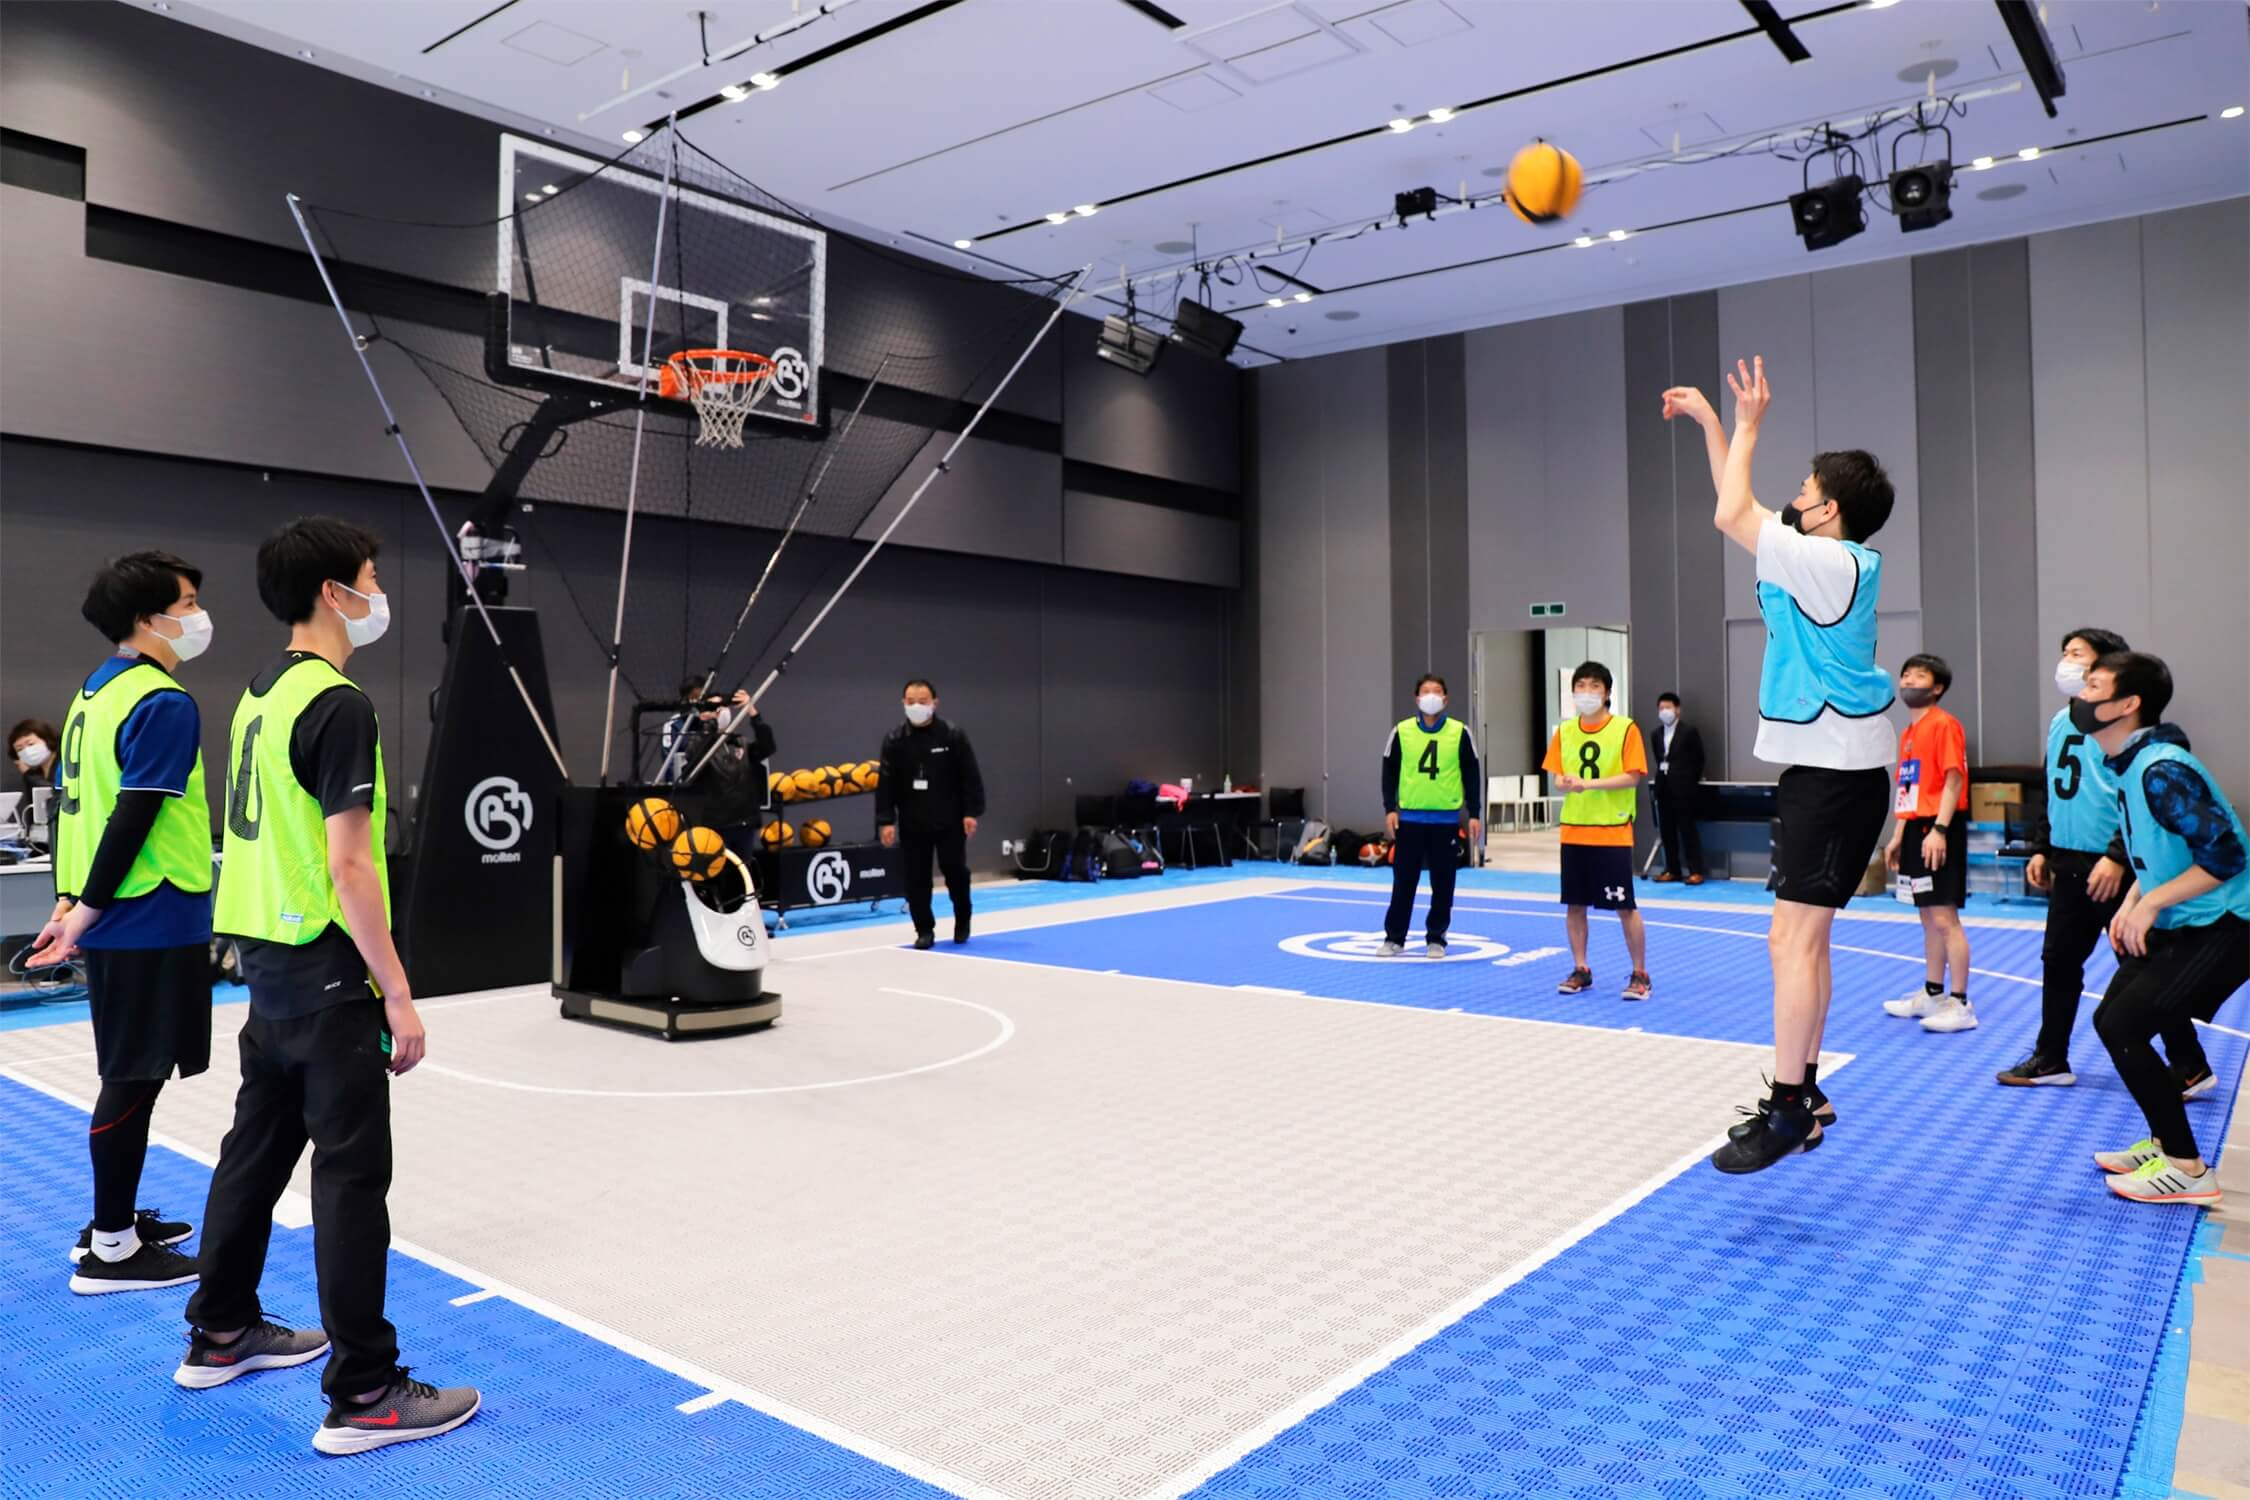 5Gでつながる、バスケットボールの未来のカタチ